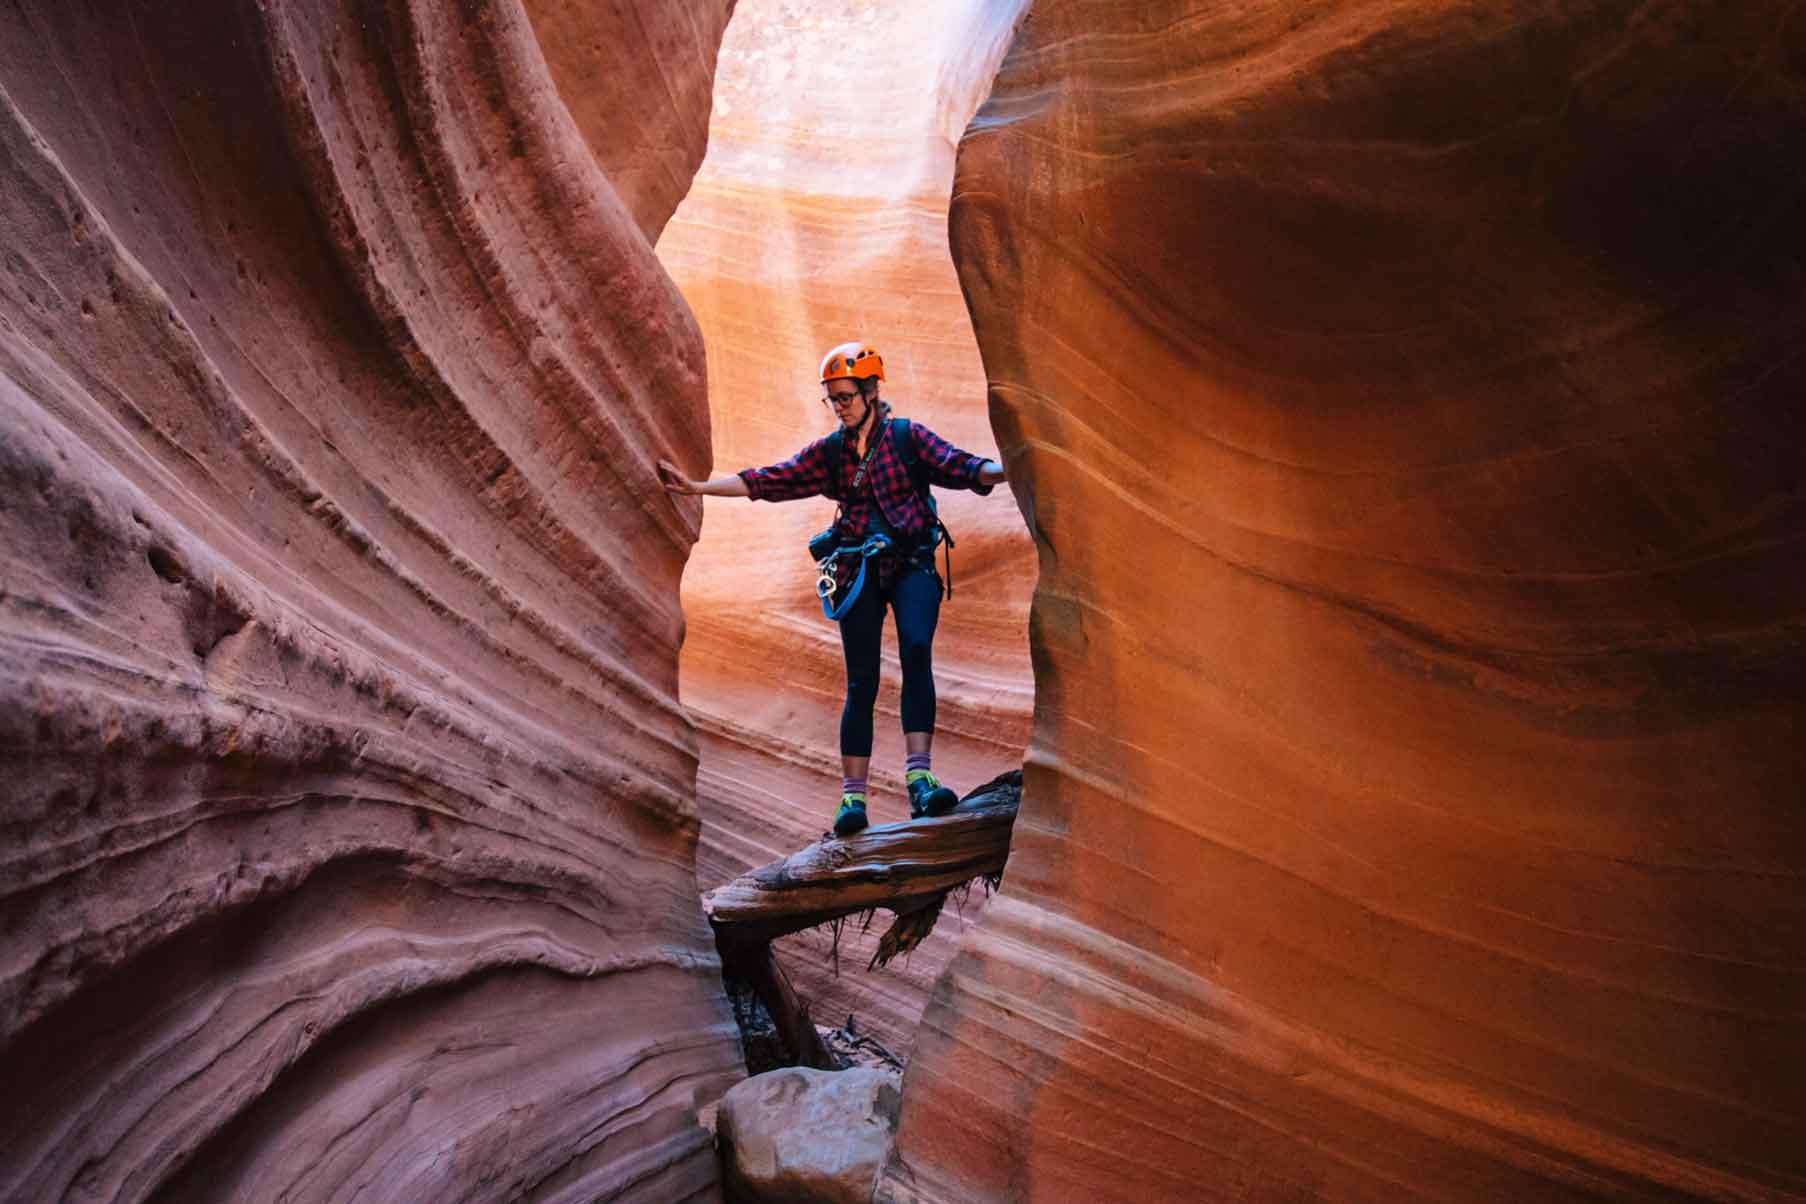 Canyoneering Zion Adventure Company The Huntress Slot Canyon 3